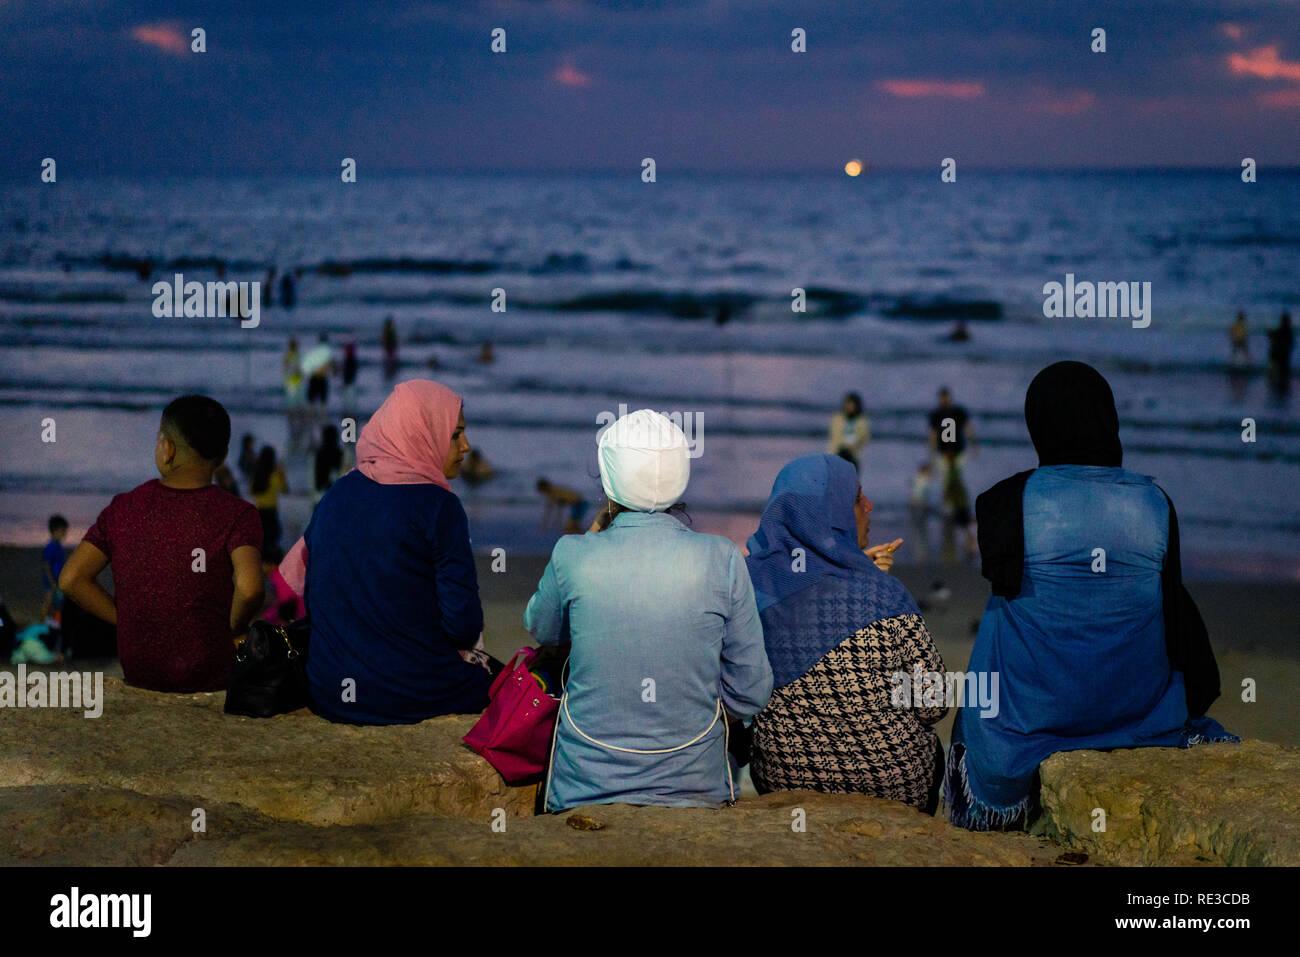 Eid al-Adha in Tel Aviv - Stock Image